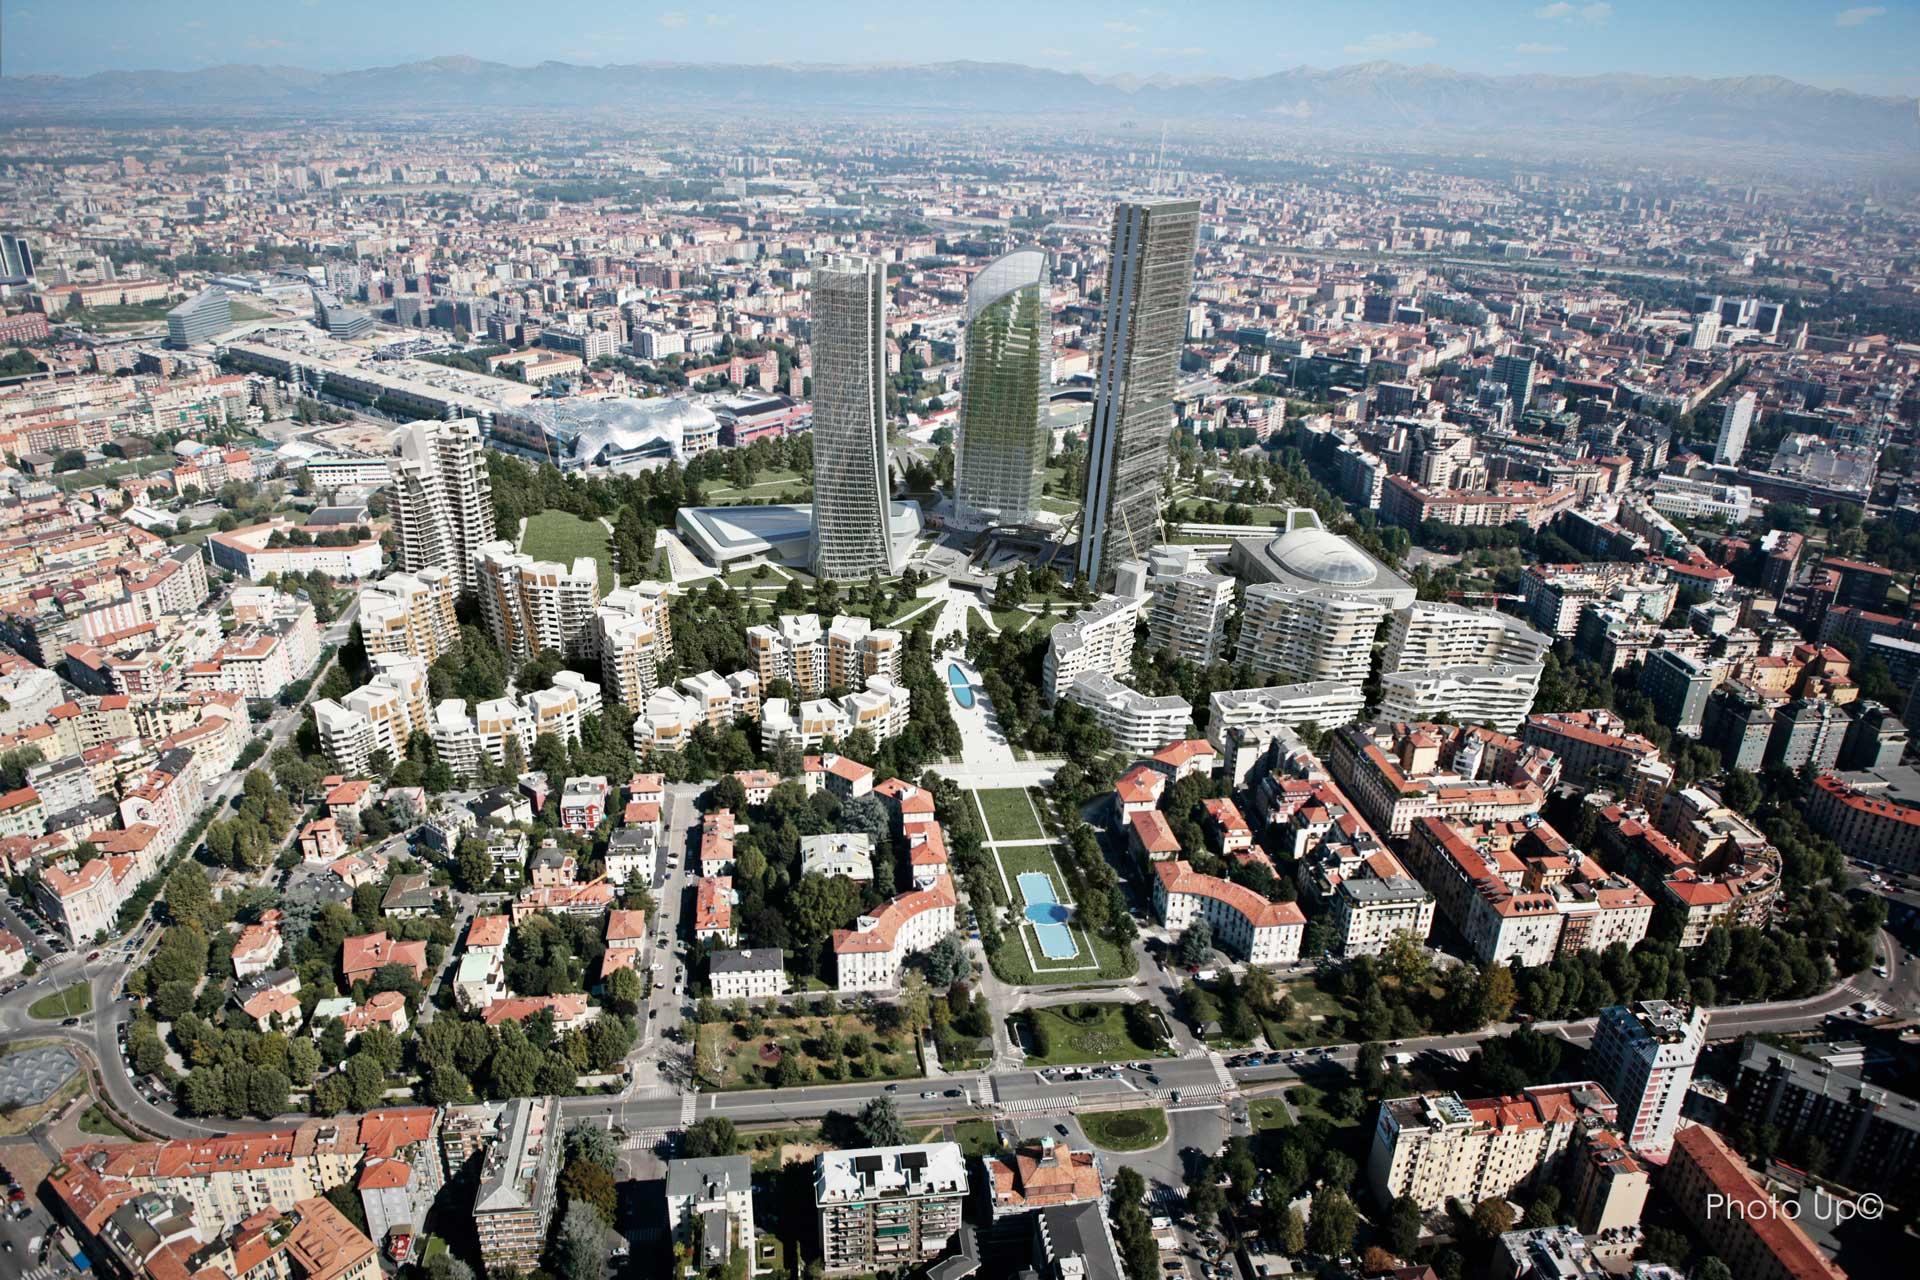 ZHA_Citylife_Generali-Tower_Milan_Aerial-View-3